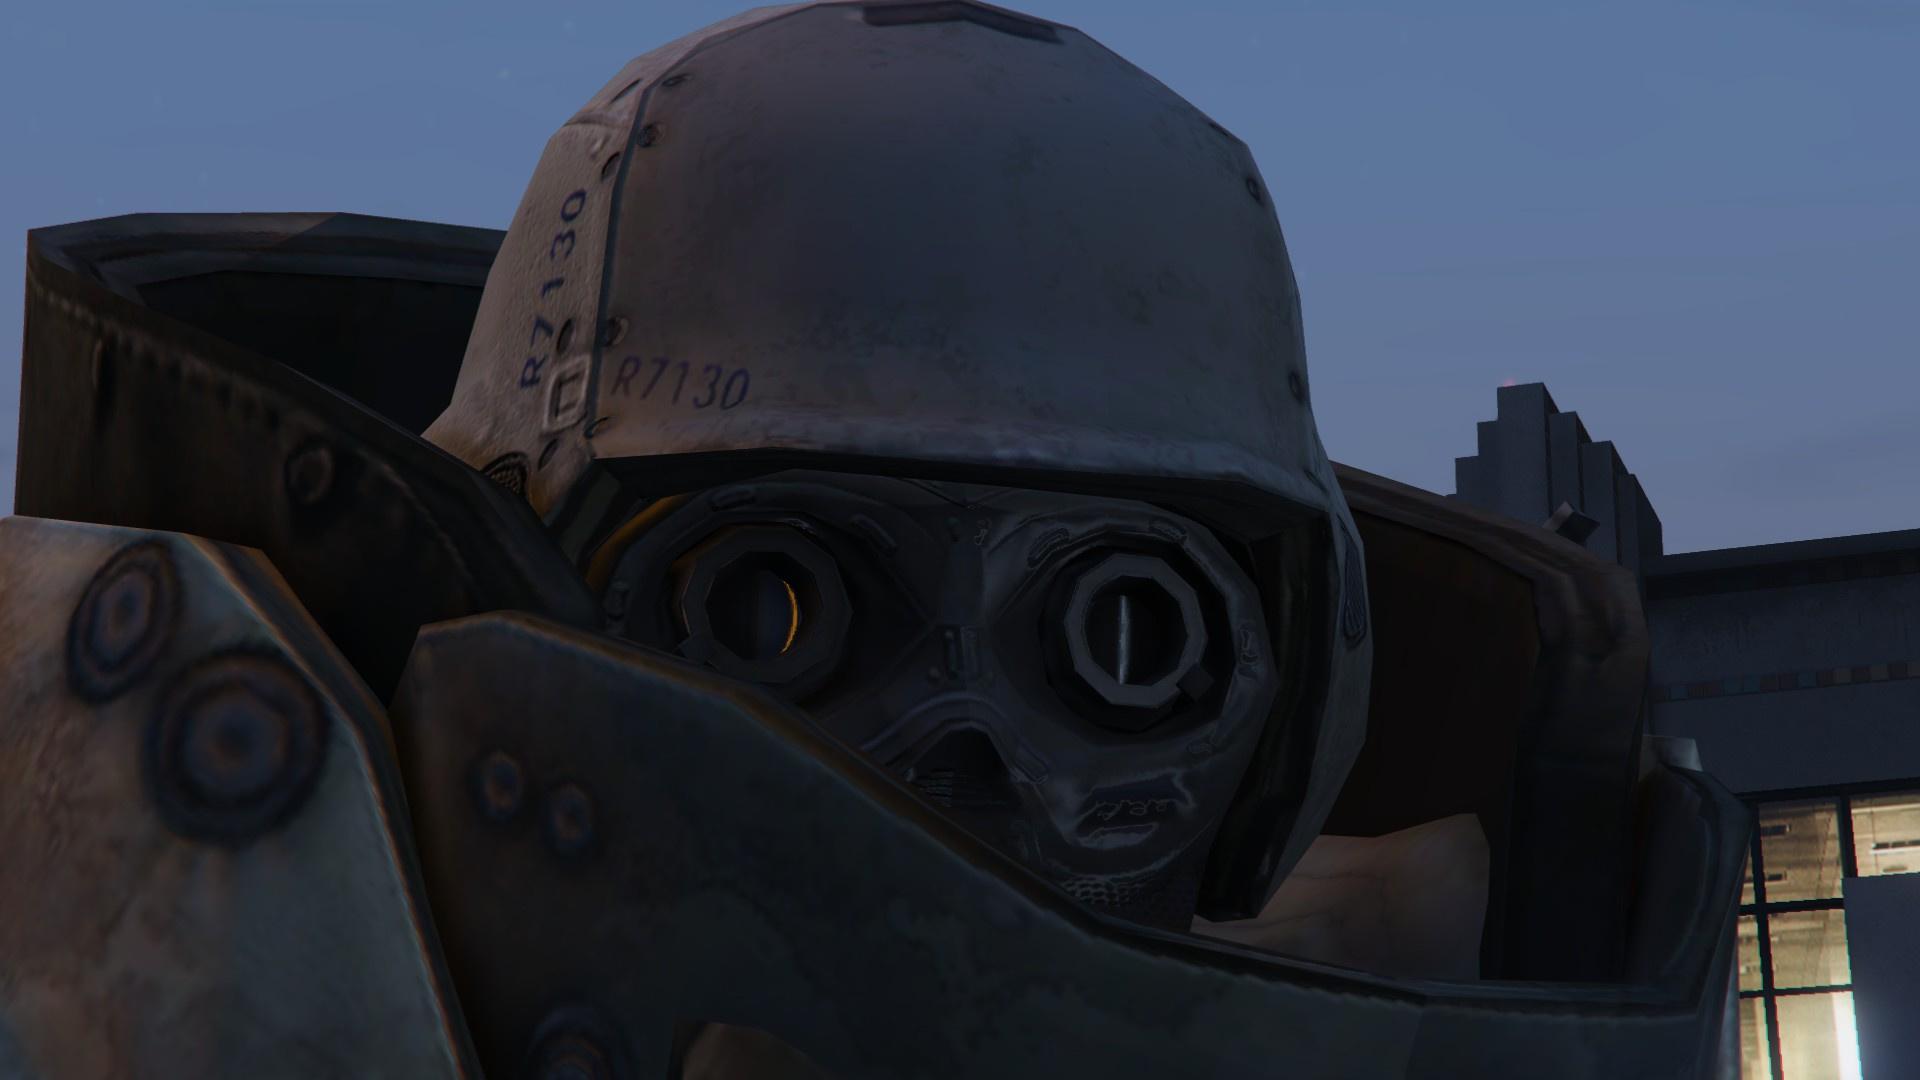 Juggernaut From MW2 [Add-On / Replace] - GTA5-Mods com